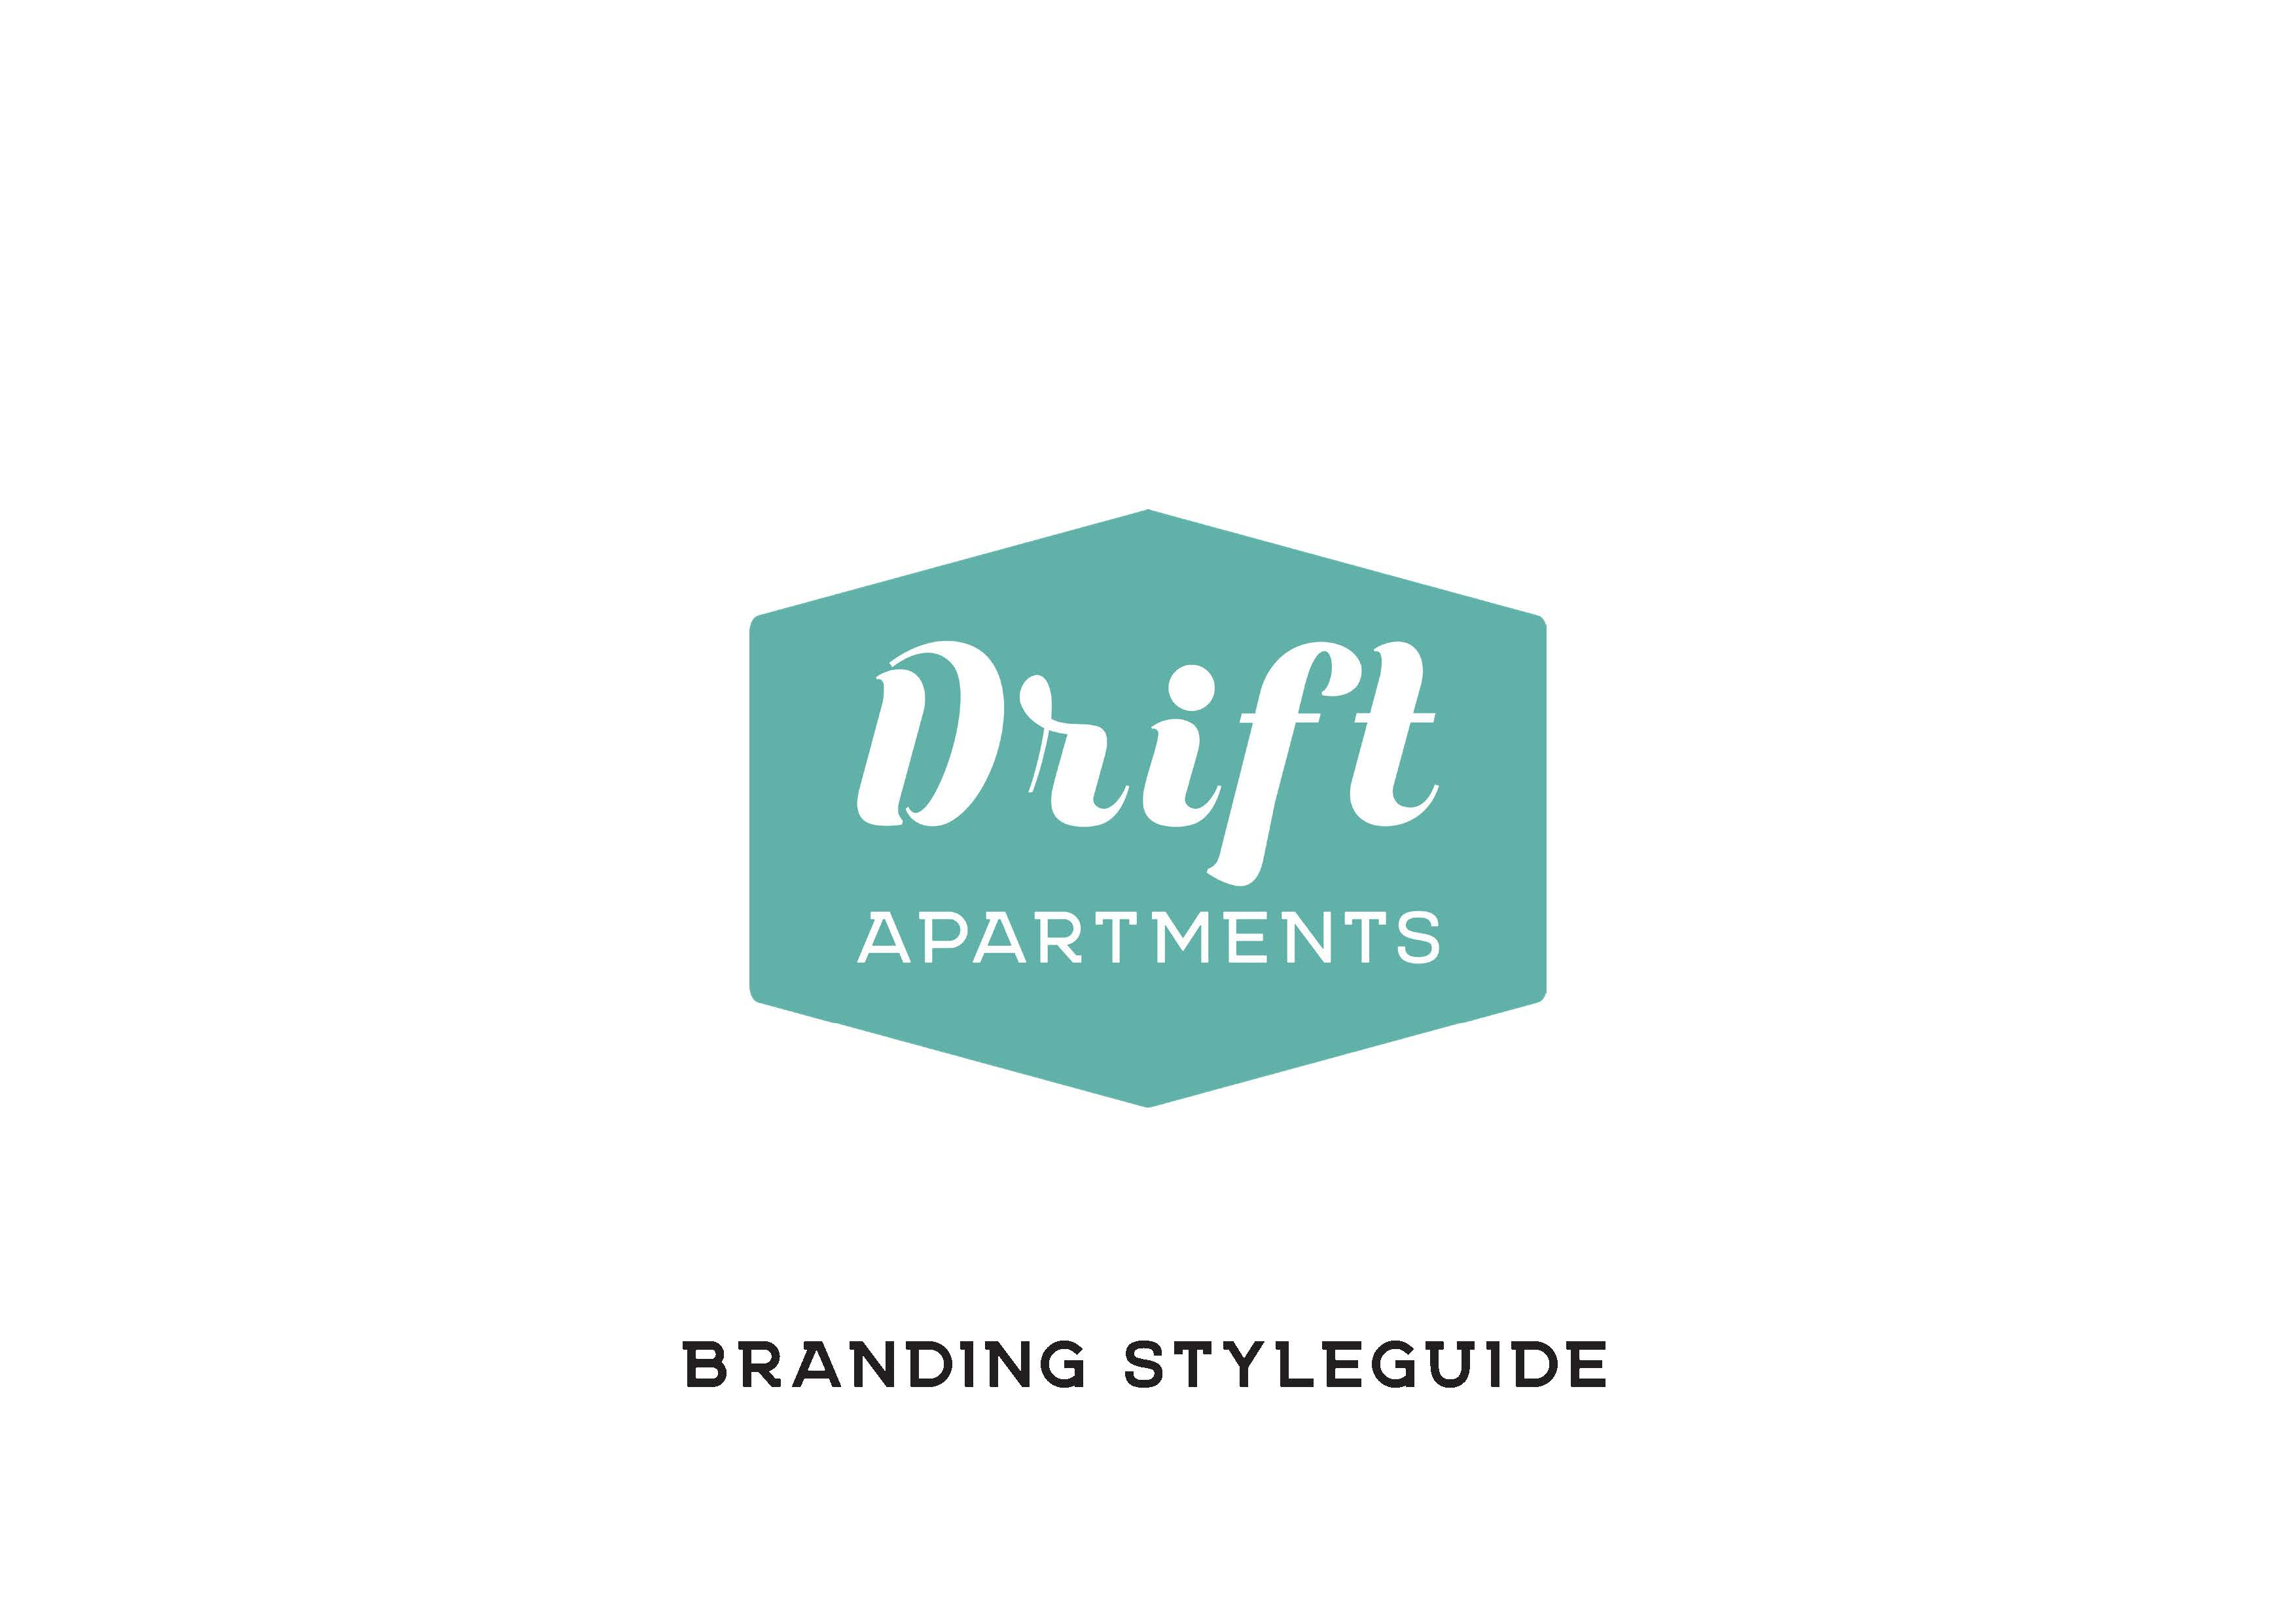 DA_Branding Styleguide_new_Page_1